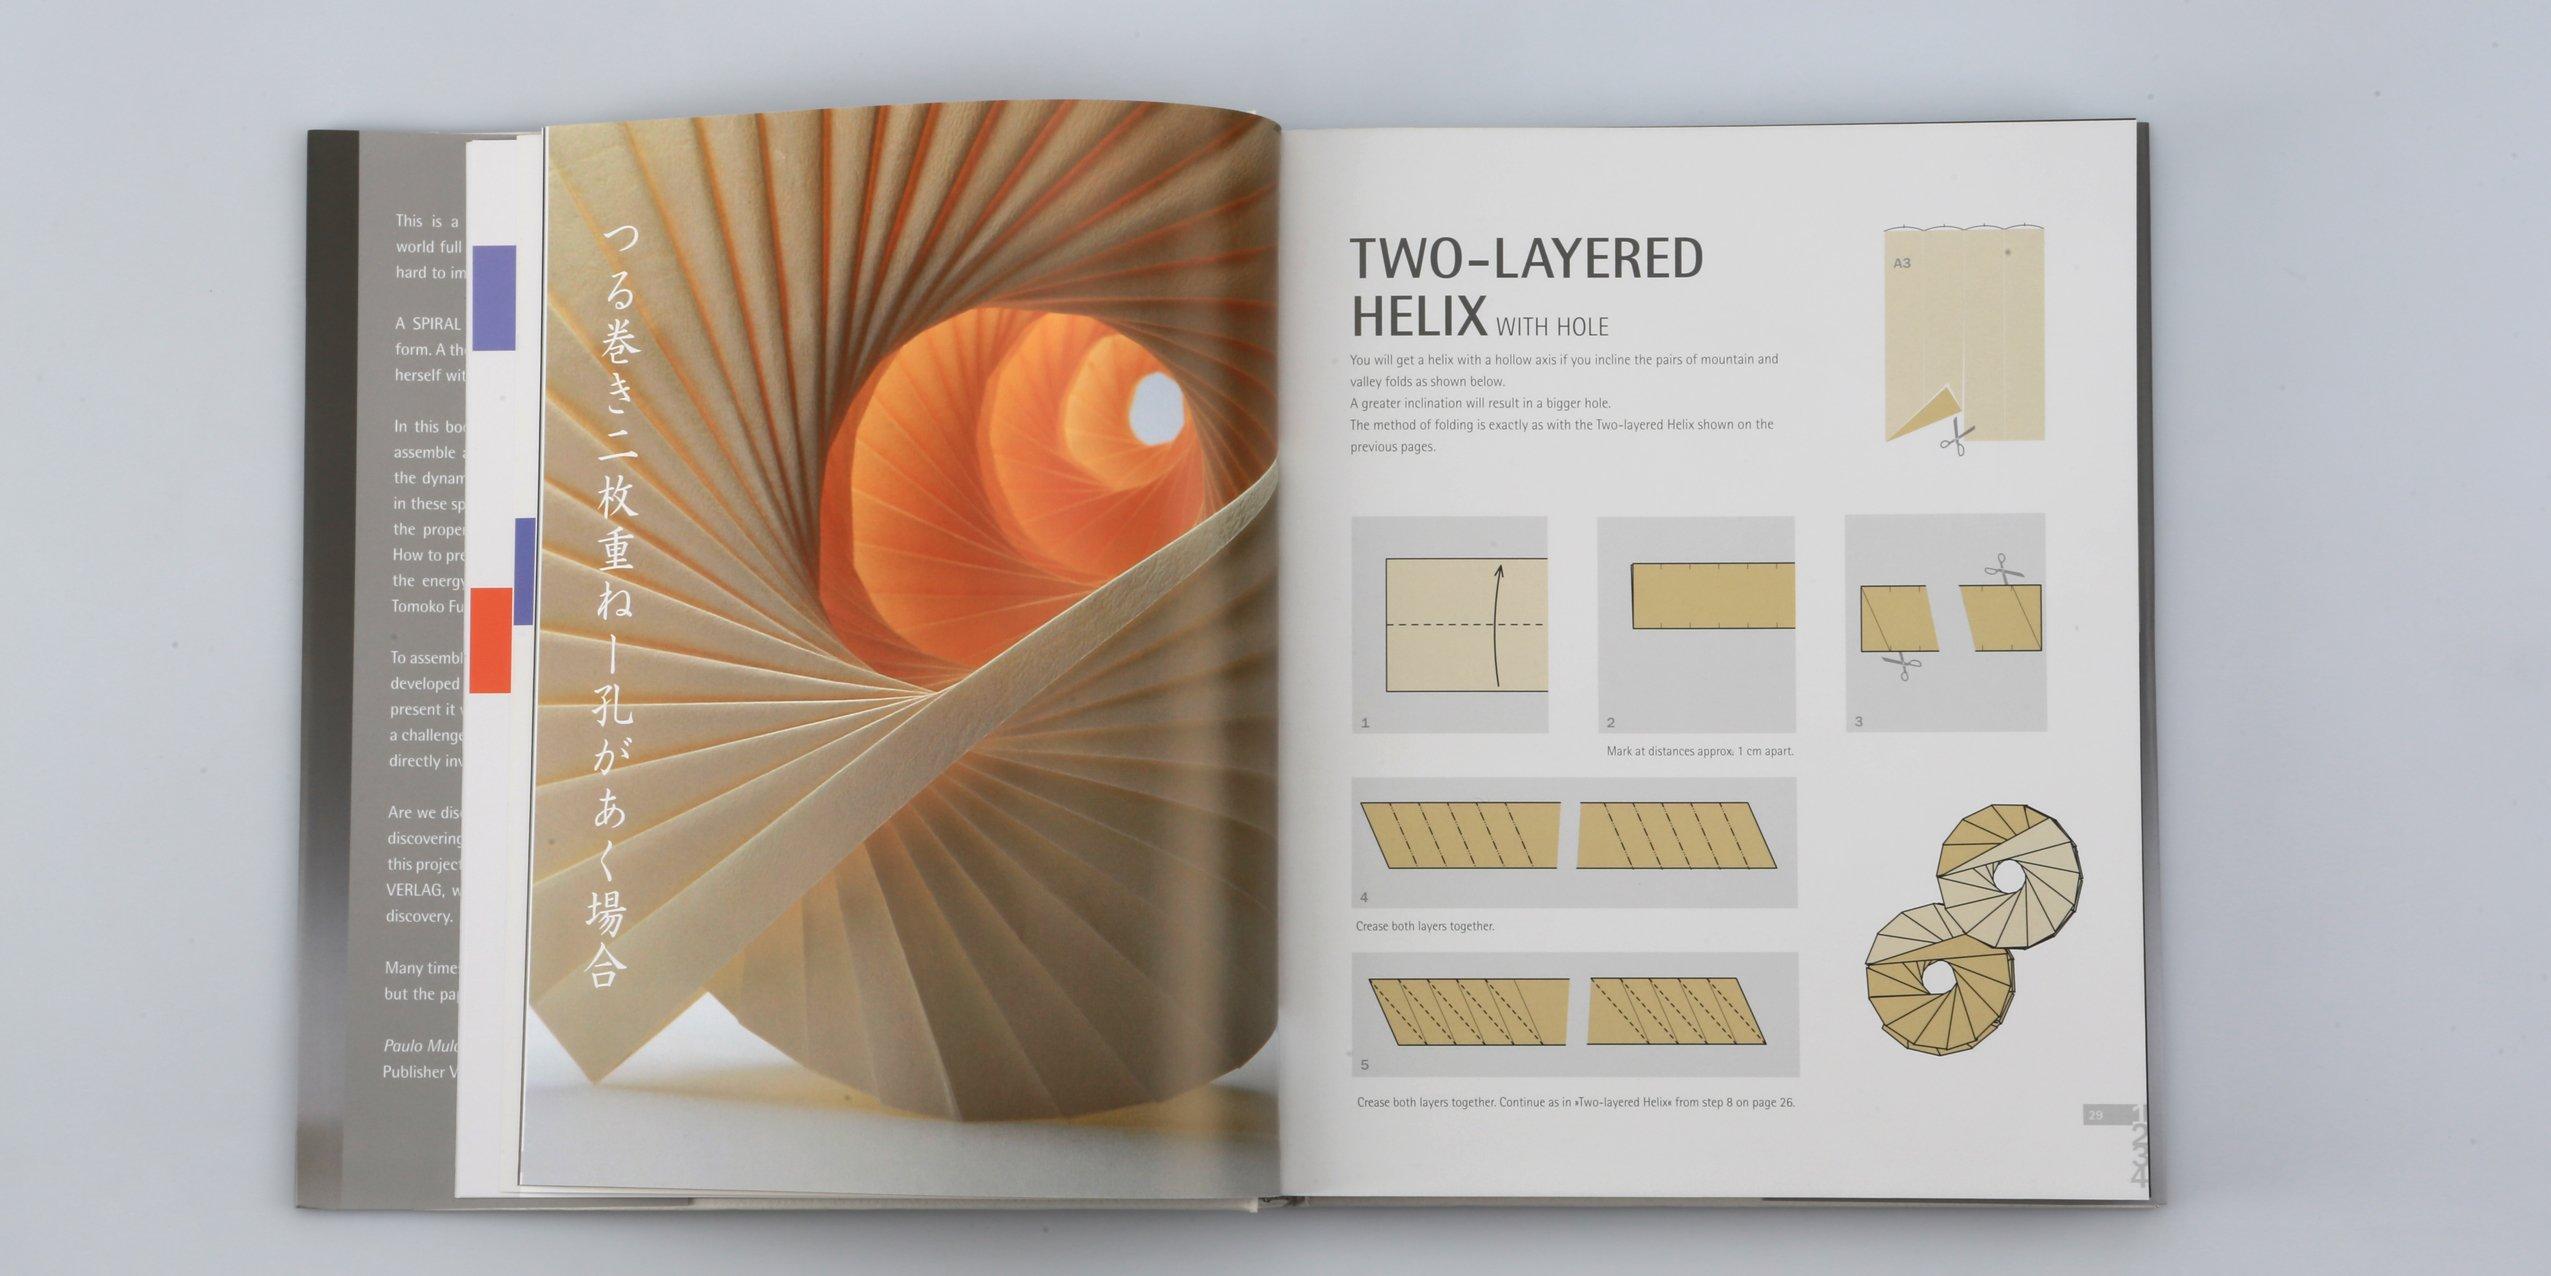 Brilliant Spiral Origami Art Design Amazon De Tomoko Fuse Koryo Miura Wiring Cloud Oideiuggs Outletorg